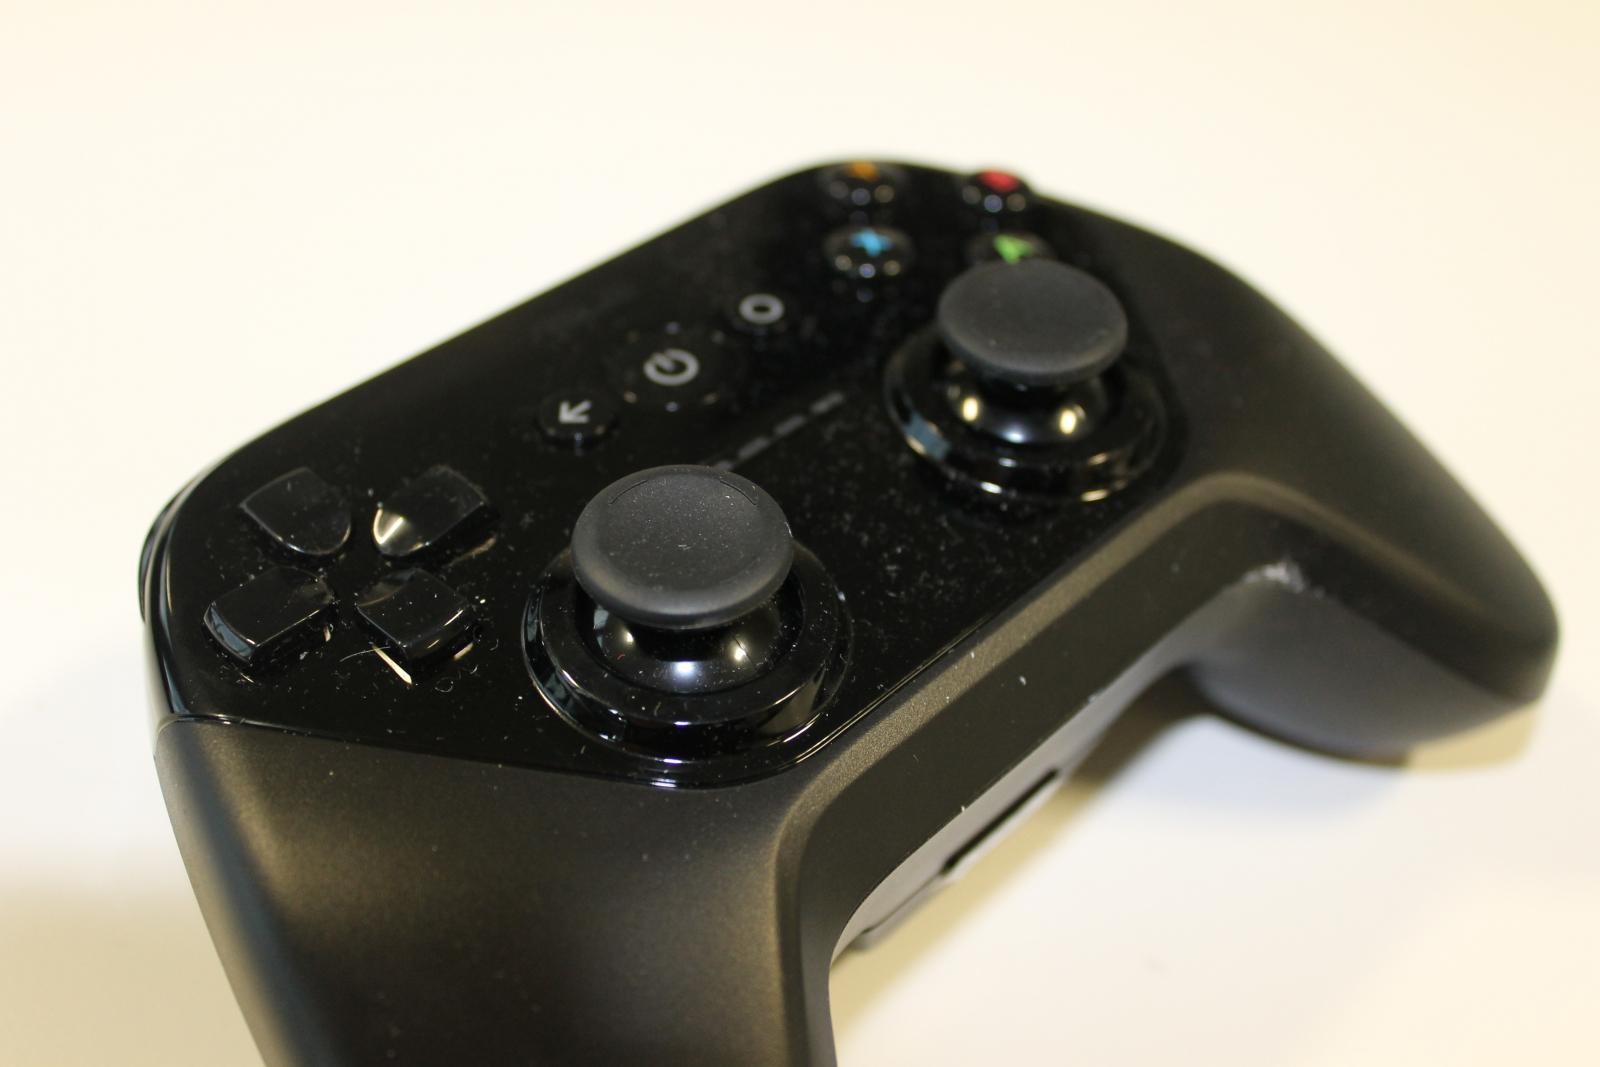 Nexus Player Bluetooth Controller Review